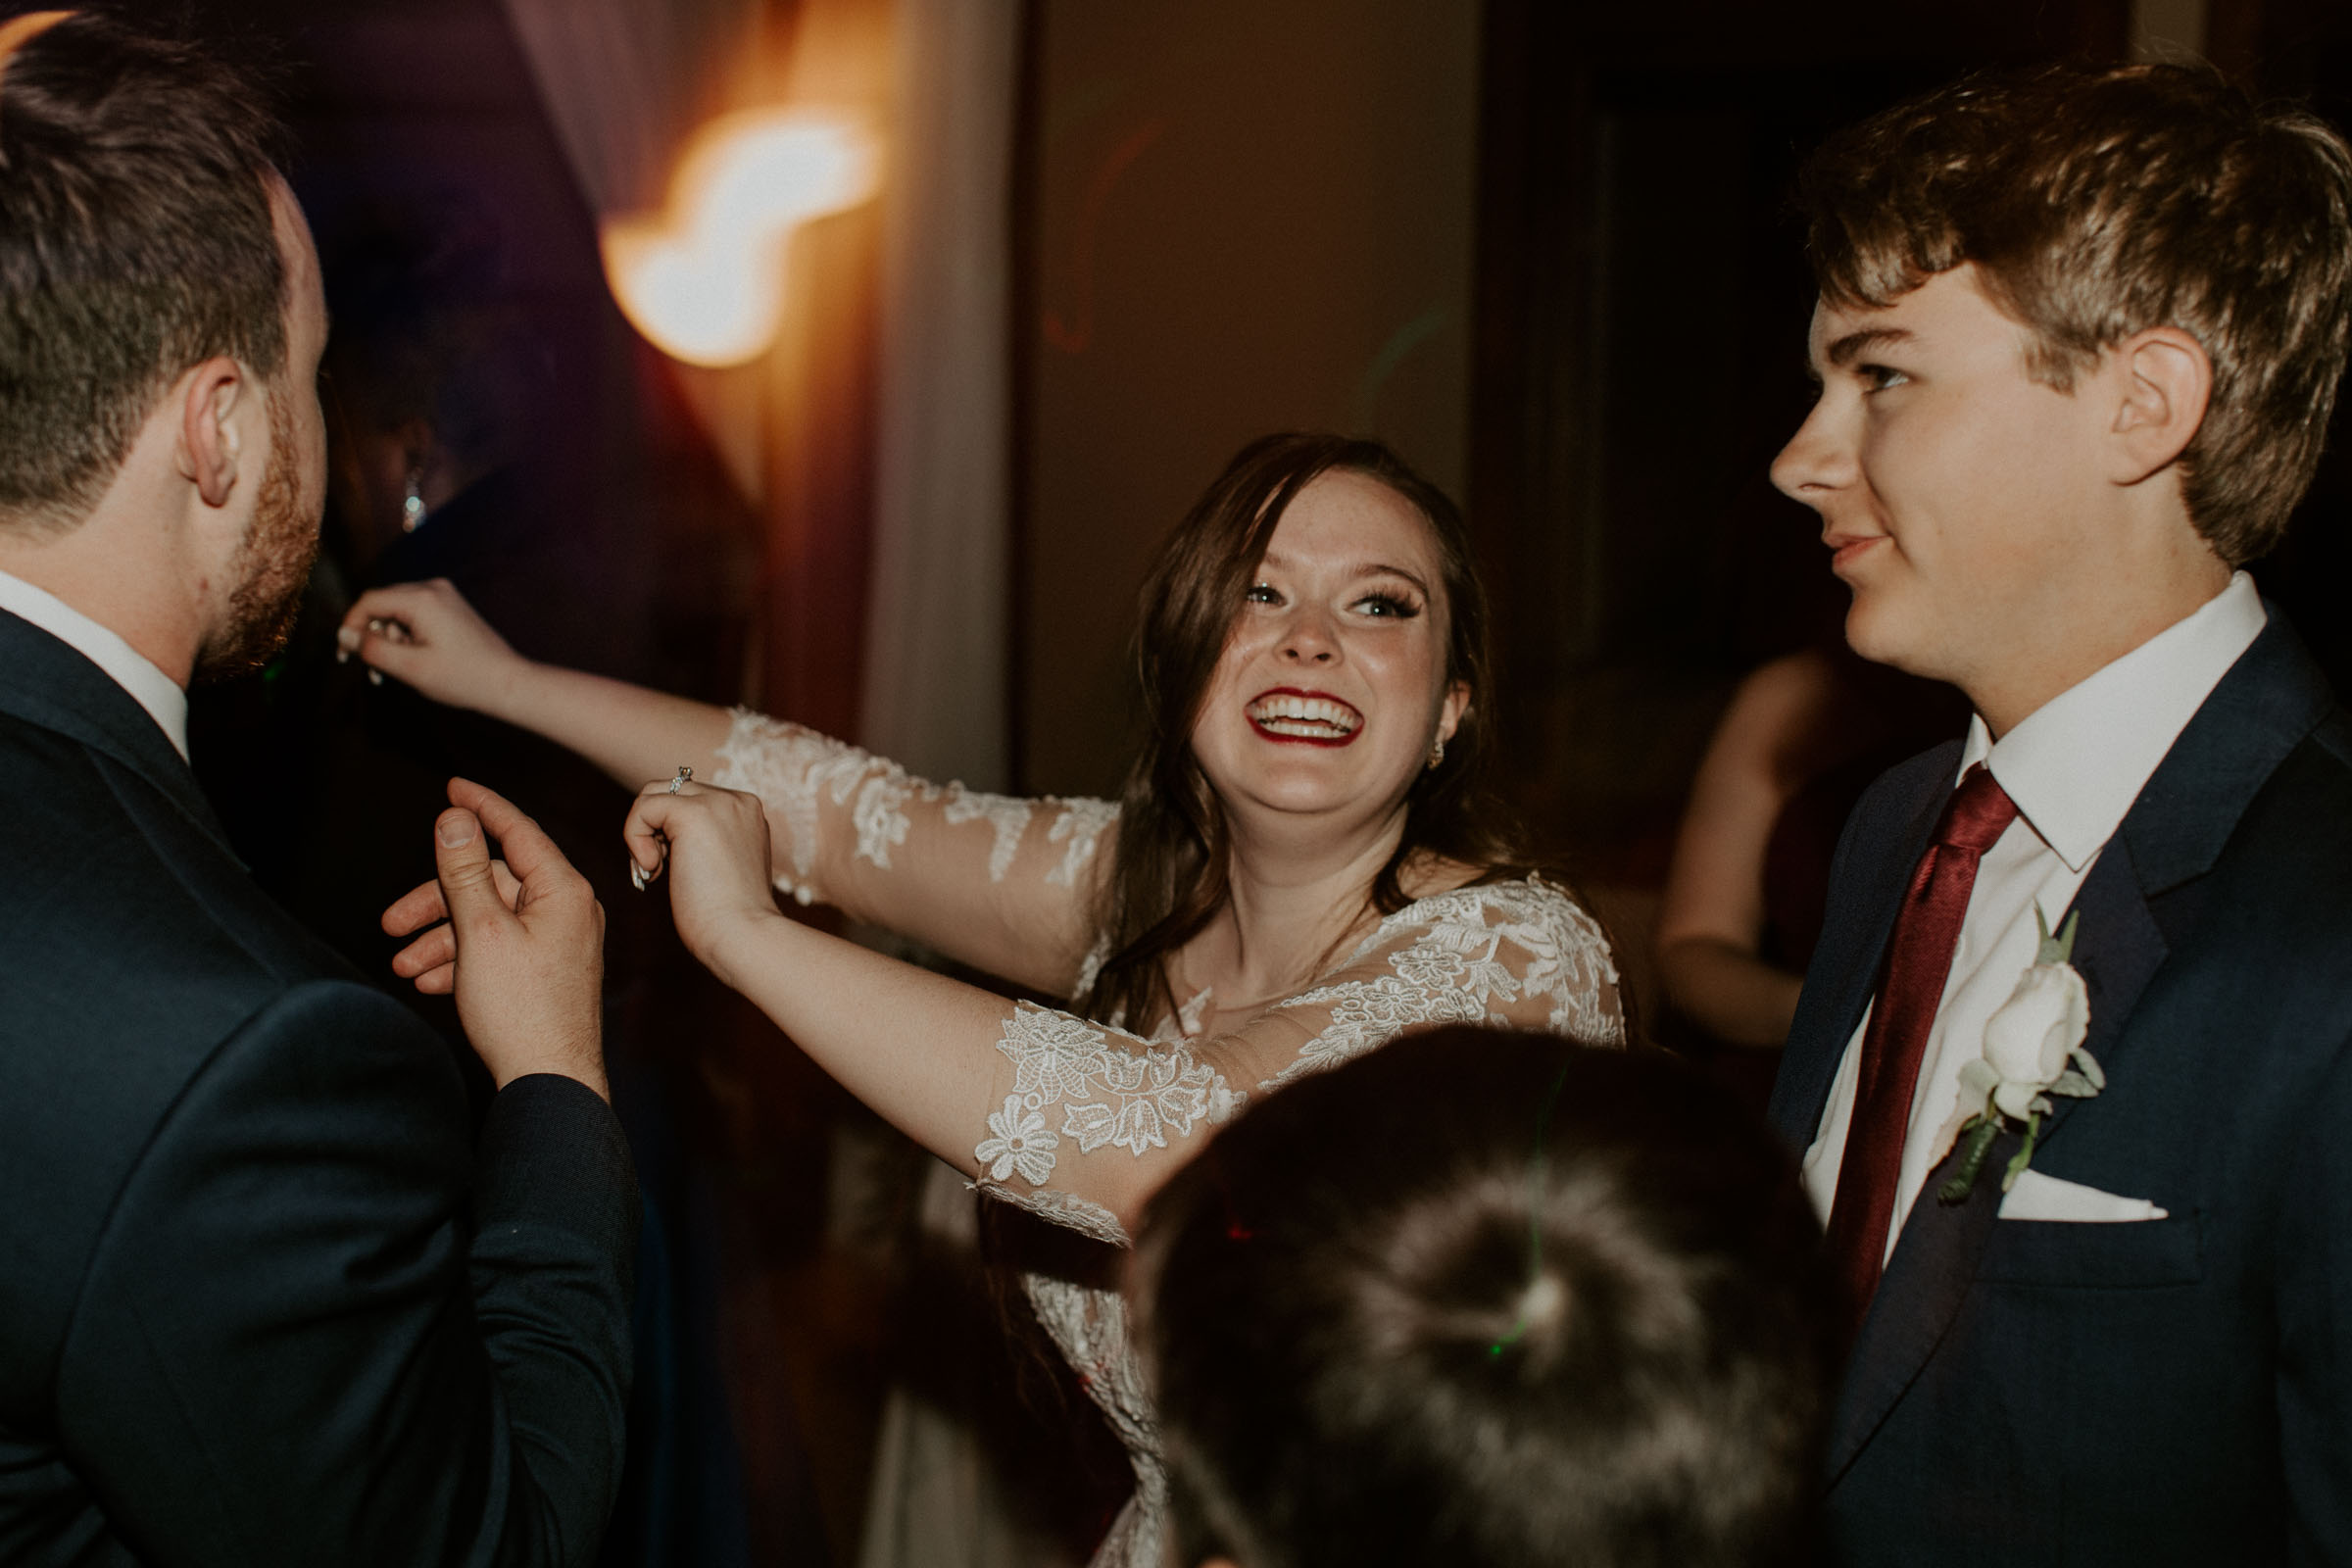 bride smiling and dancing at wedding reception